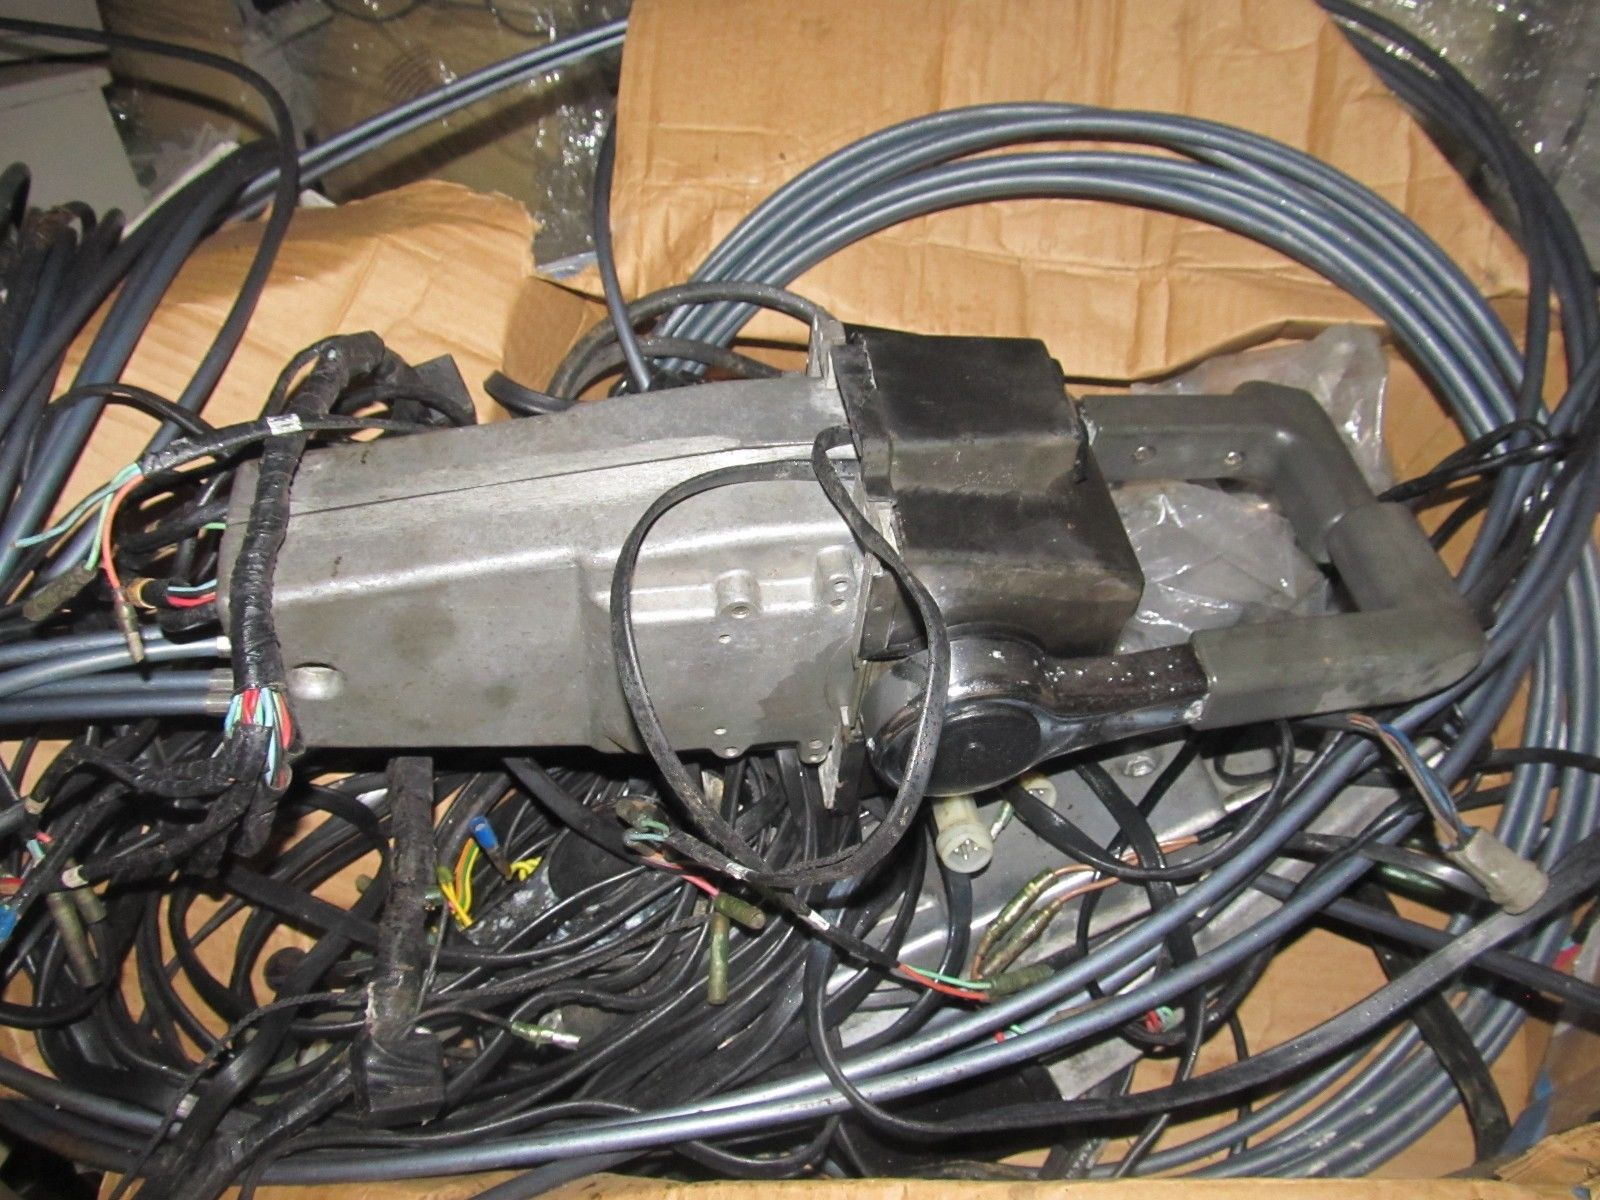 hight resolution of yamaha 704 dual twin engine